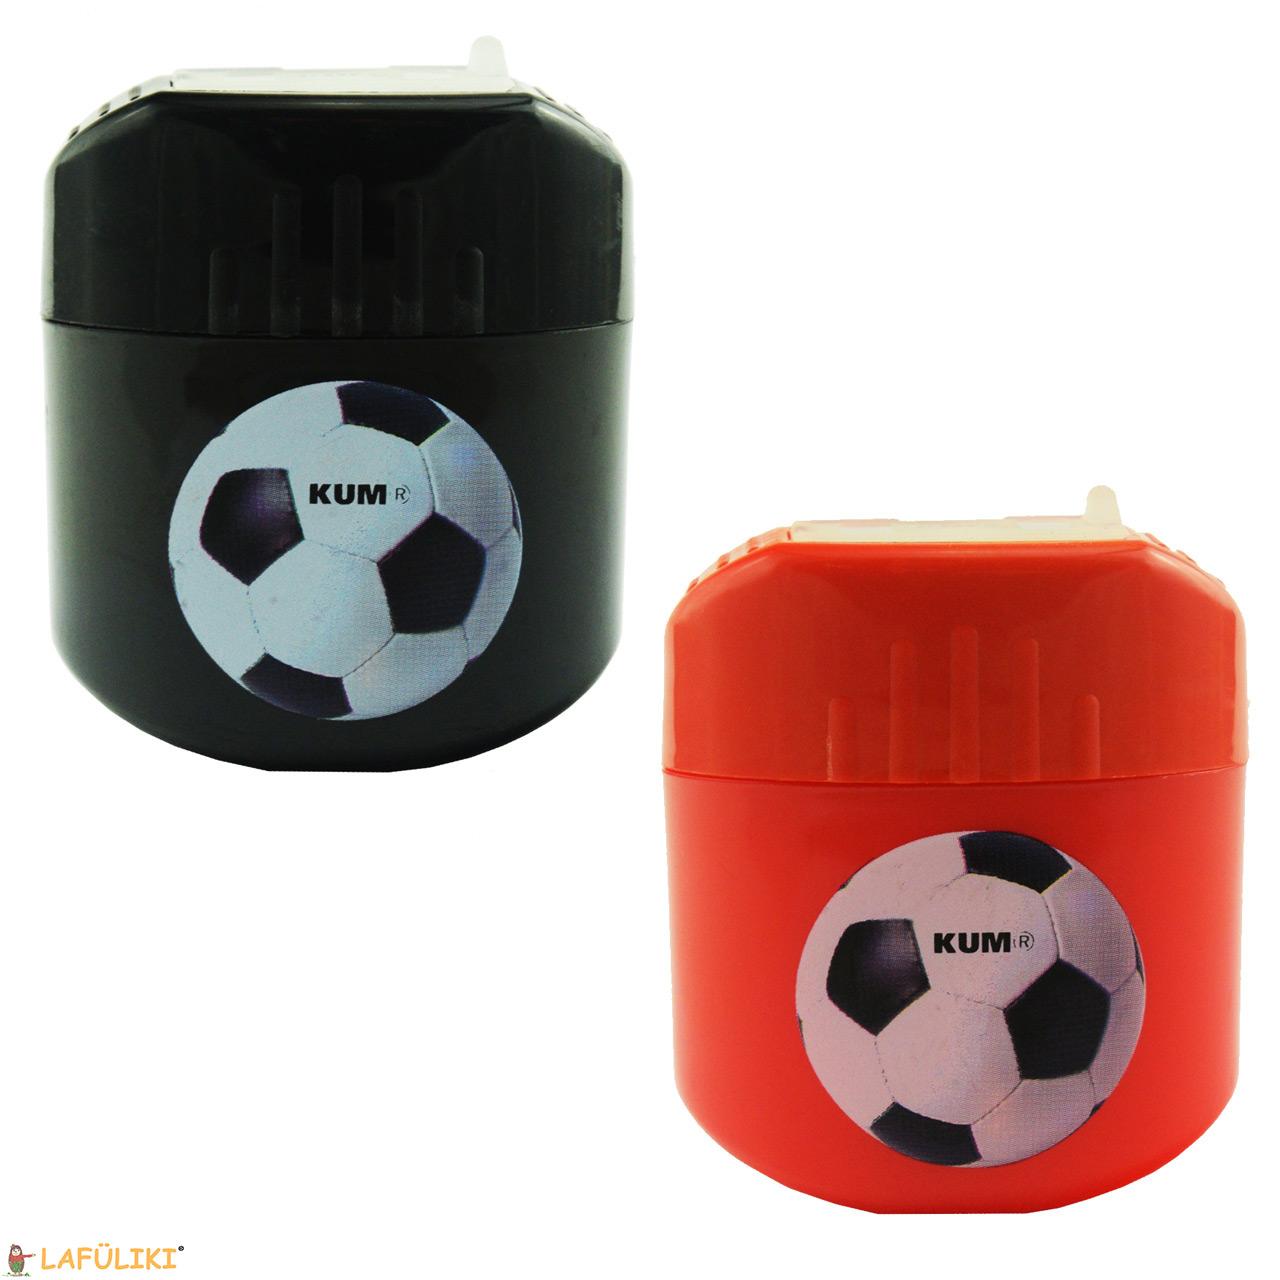 Kum-Doppelspitzer-Rechtshaender-Fussball-dosenspitzer-lafueliki